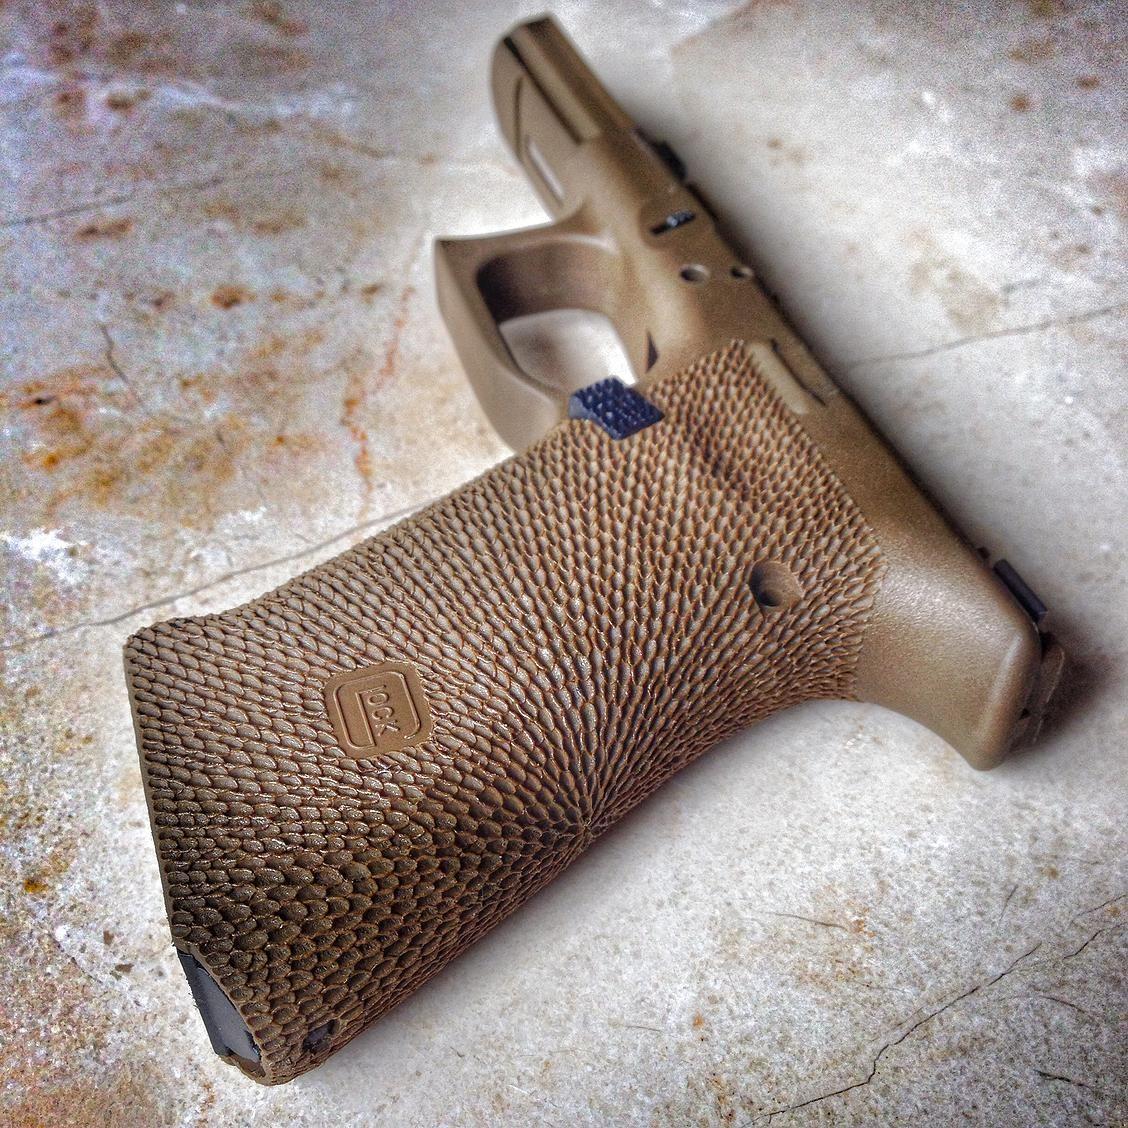 Damato Custom Stippling and Cerakote MP Glock Grip | Stippling